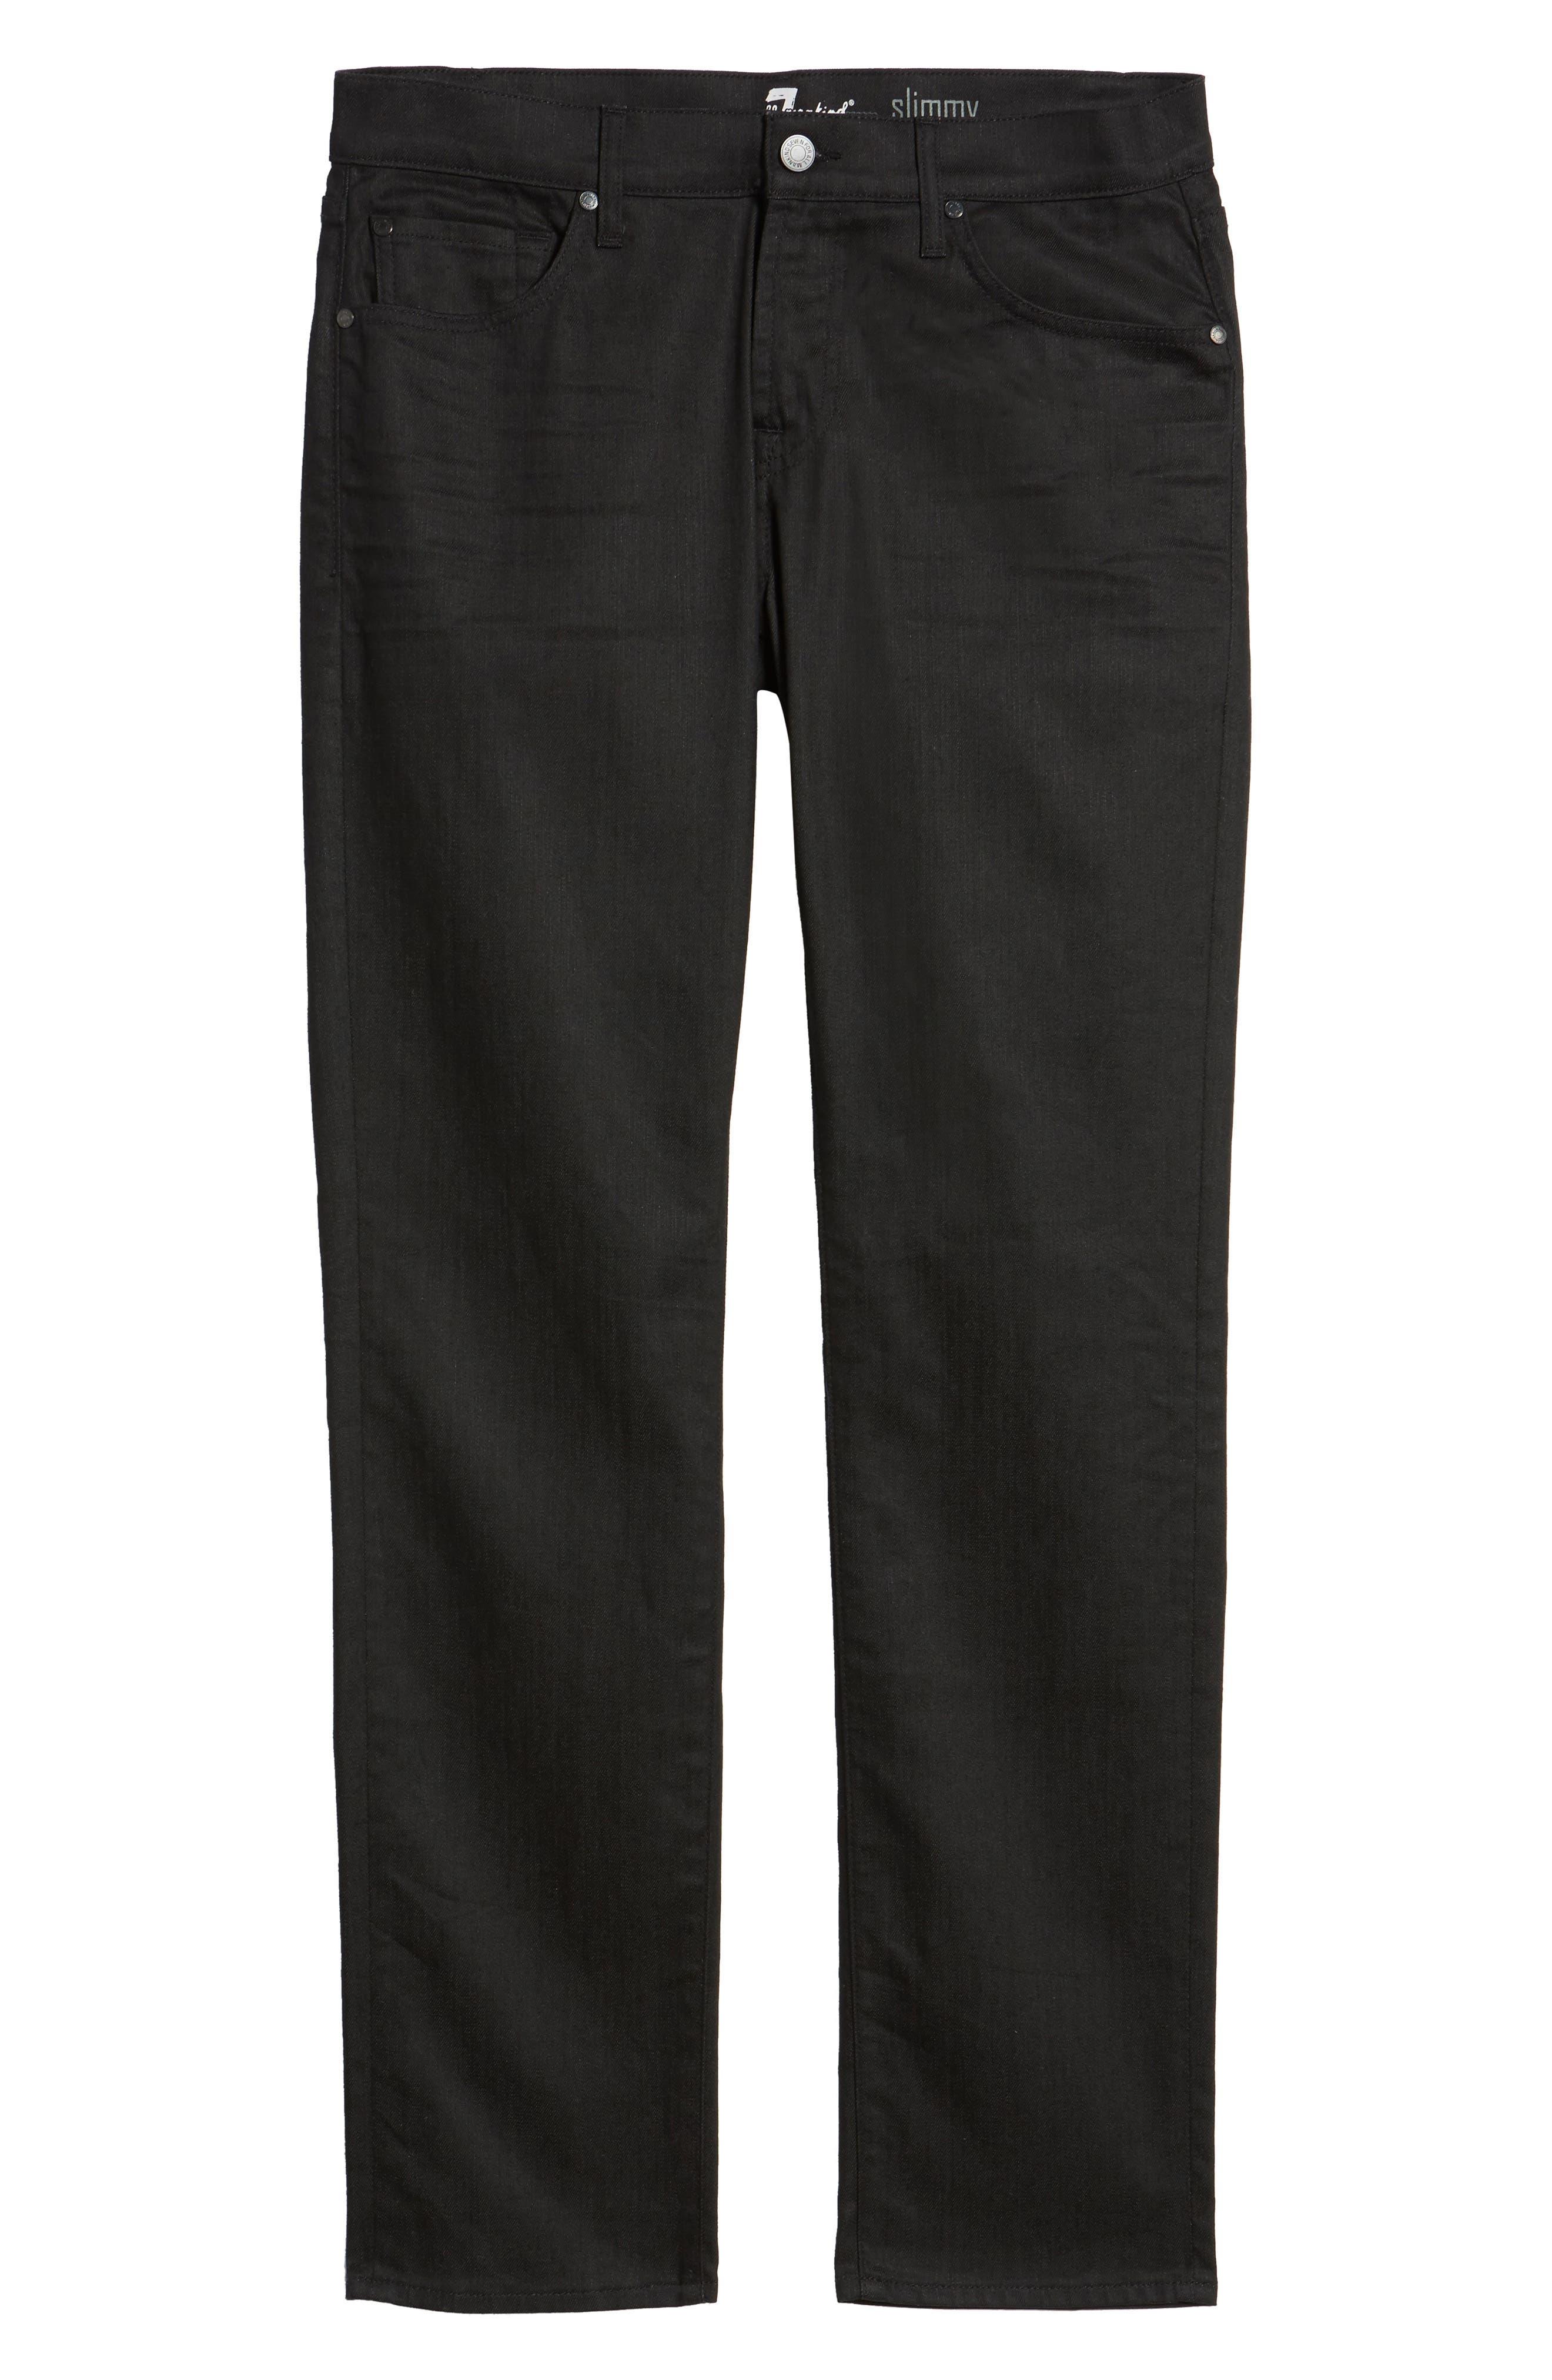 Airweft - Slimmy Slim Fit Jeans,                             Alternate thumbnail 6, color,                             004